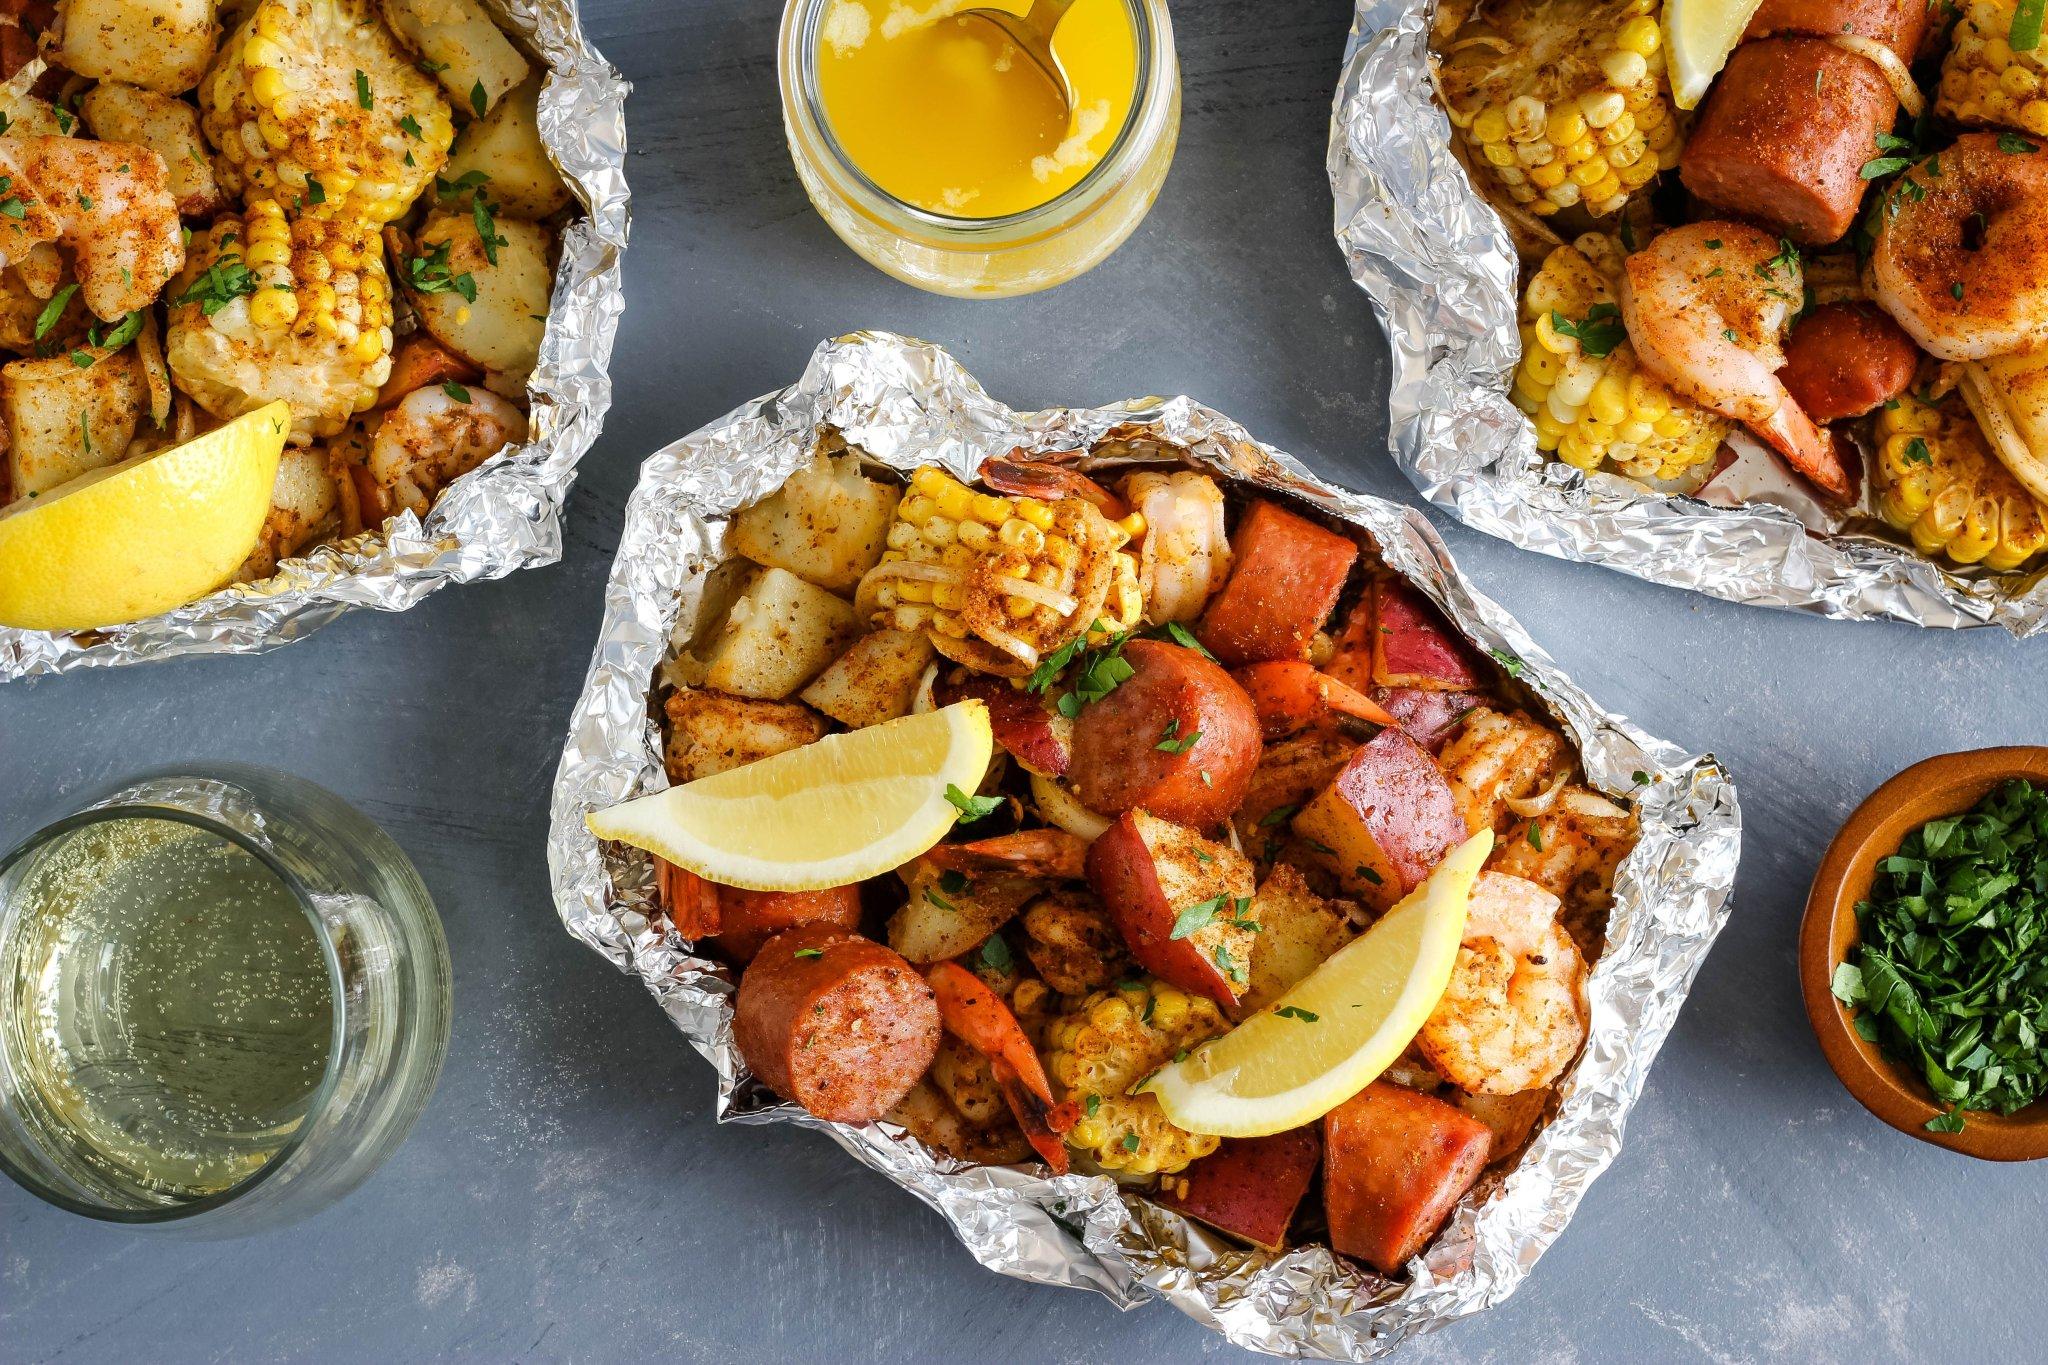 How to Make Savory Shrimp Boil